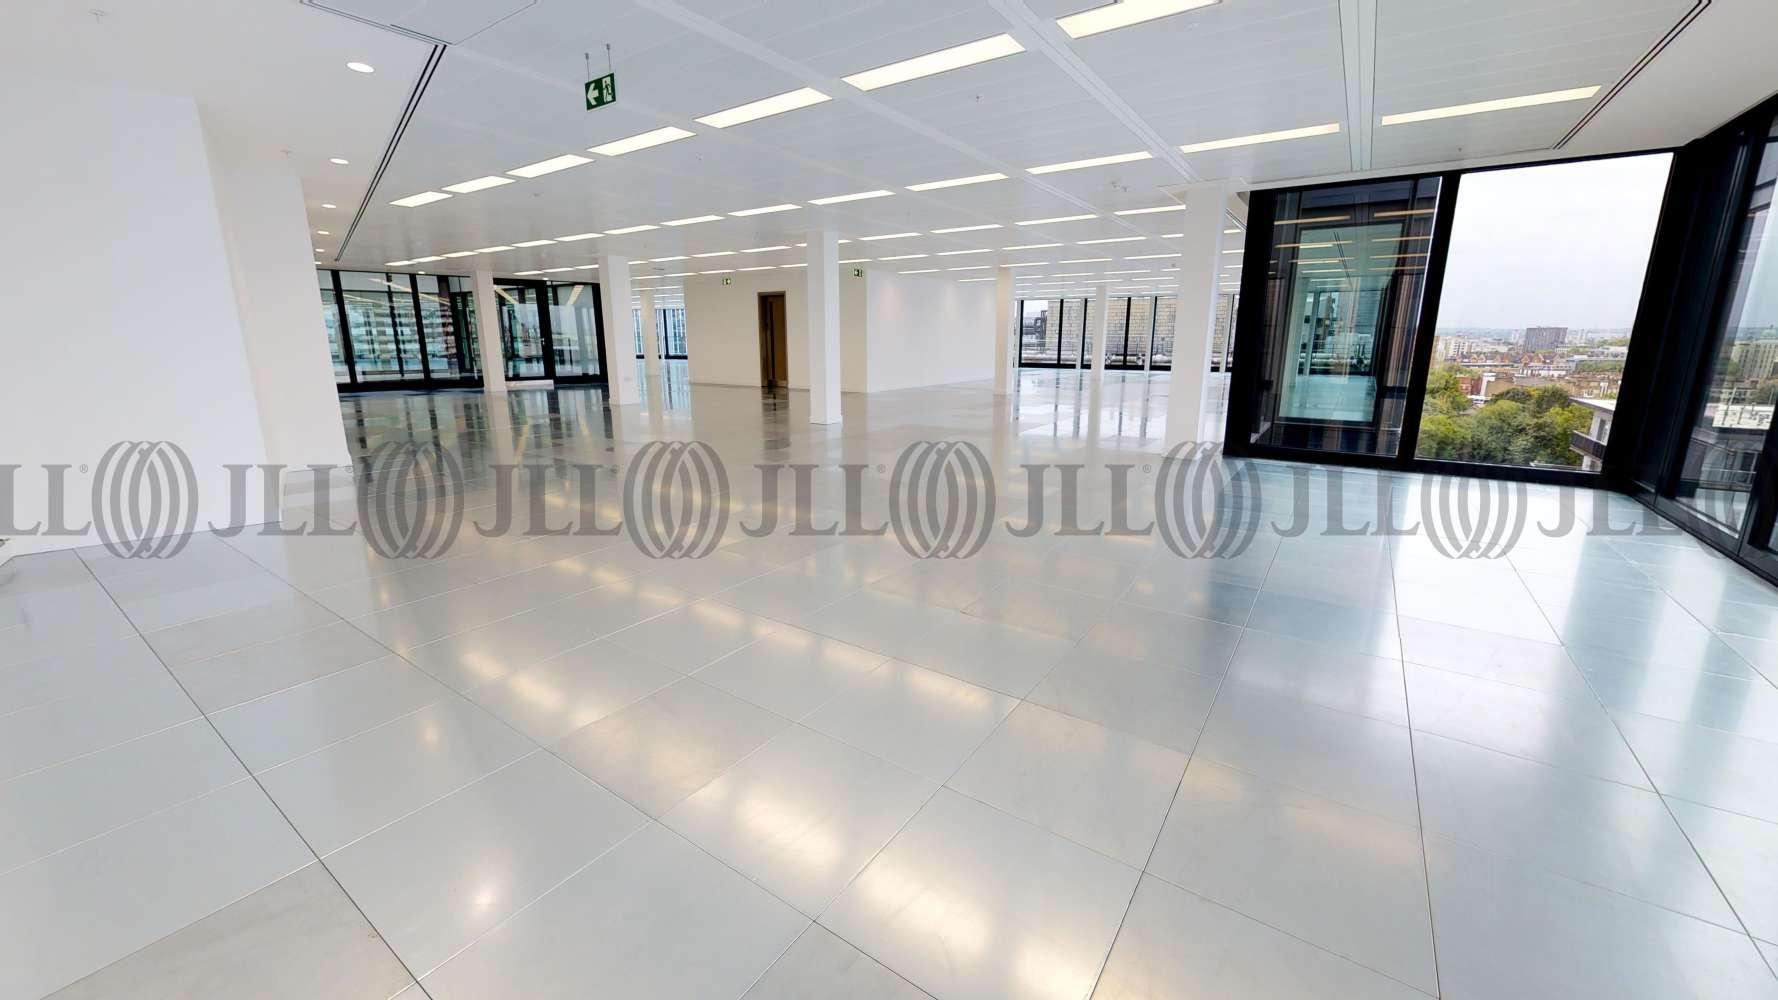 Office London, SE1 9LS - Vivo - South Bank Central - 4